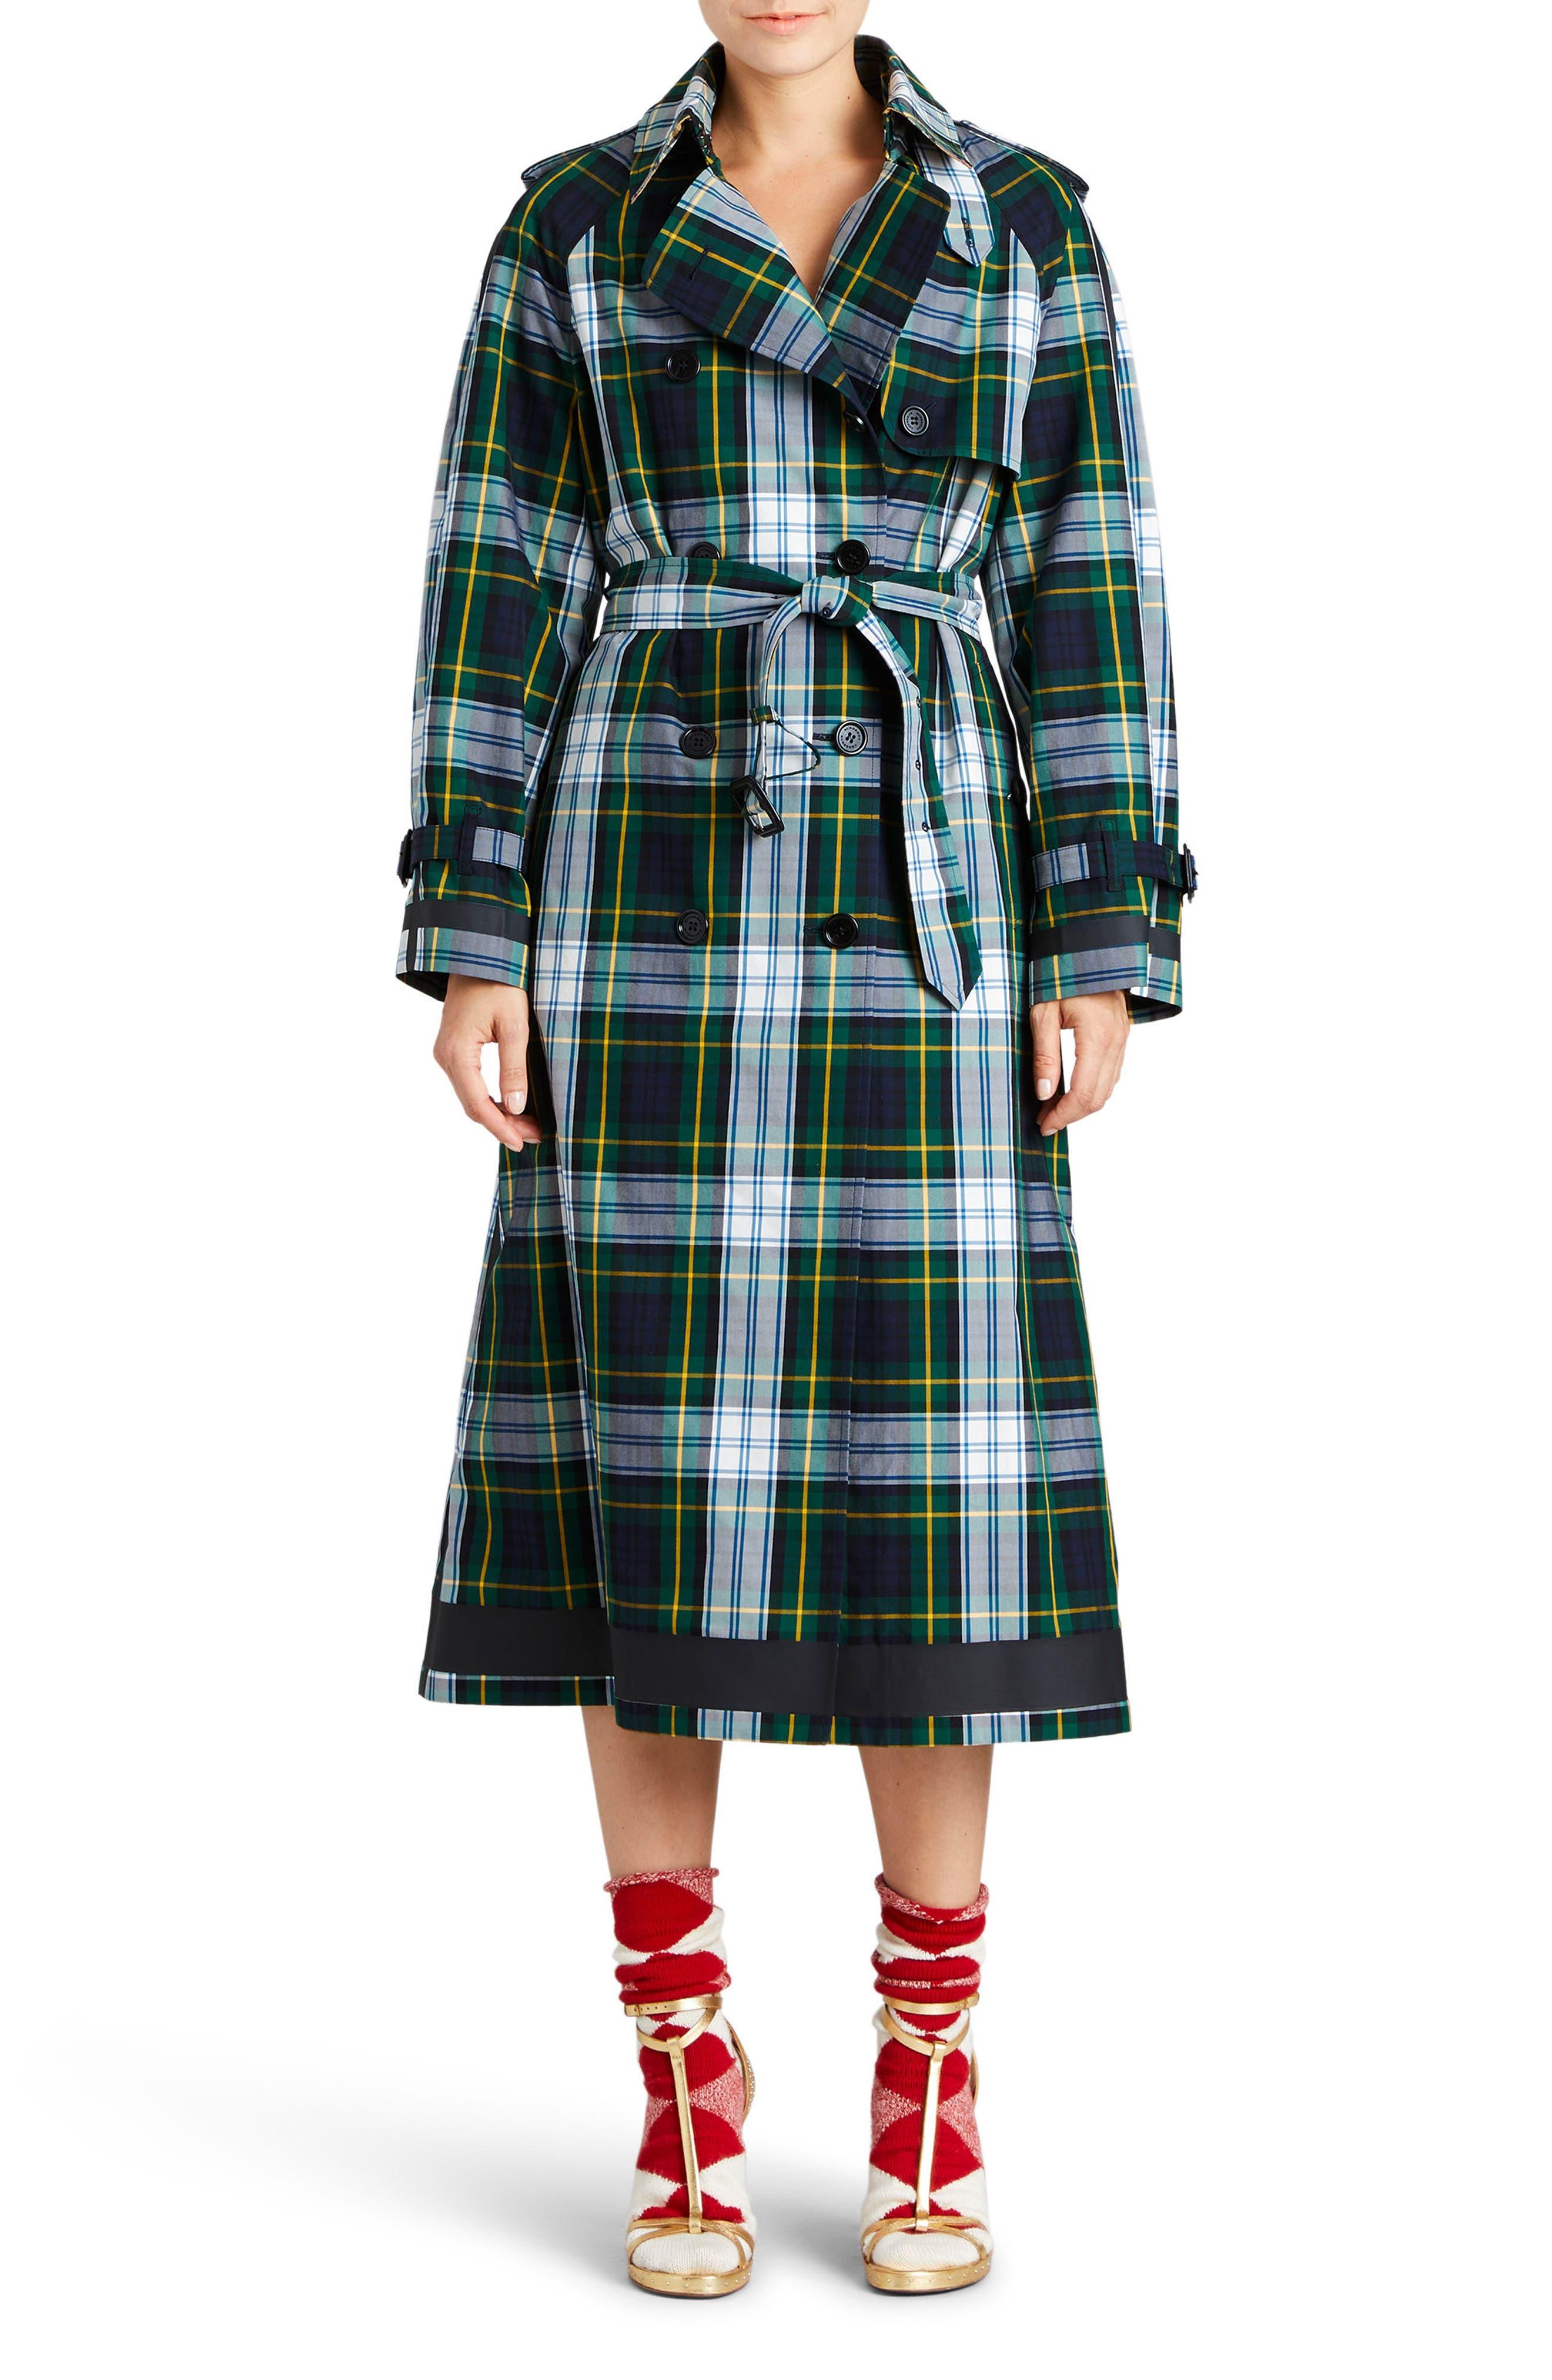 Main Image - Burberry Tartan Cotton Gabardine Trench Coat